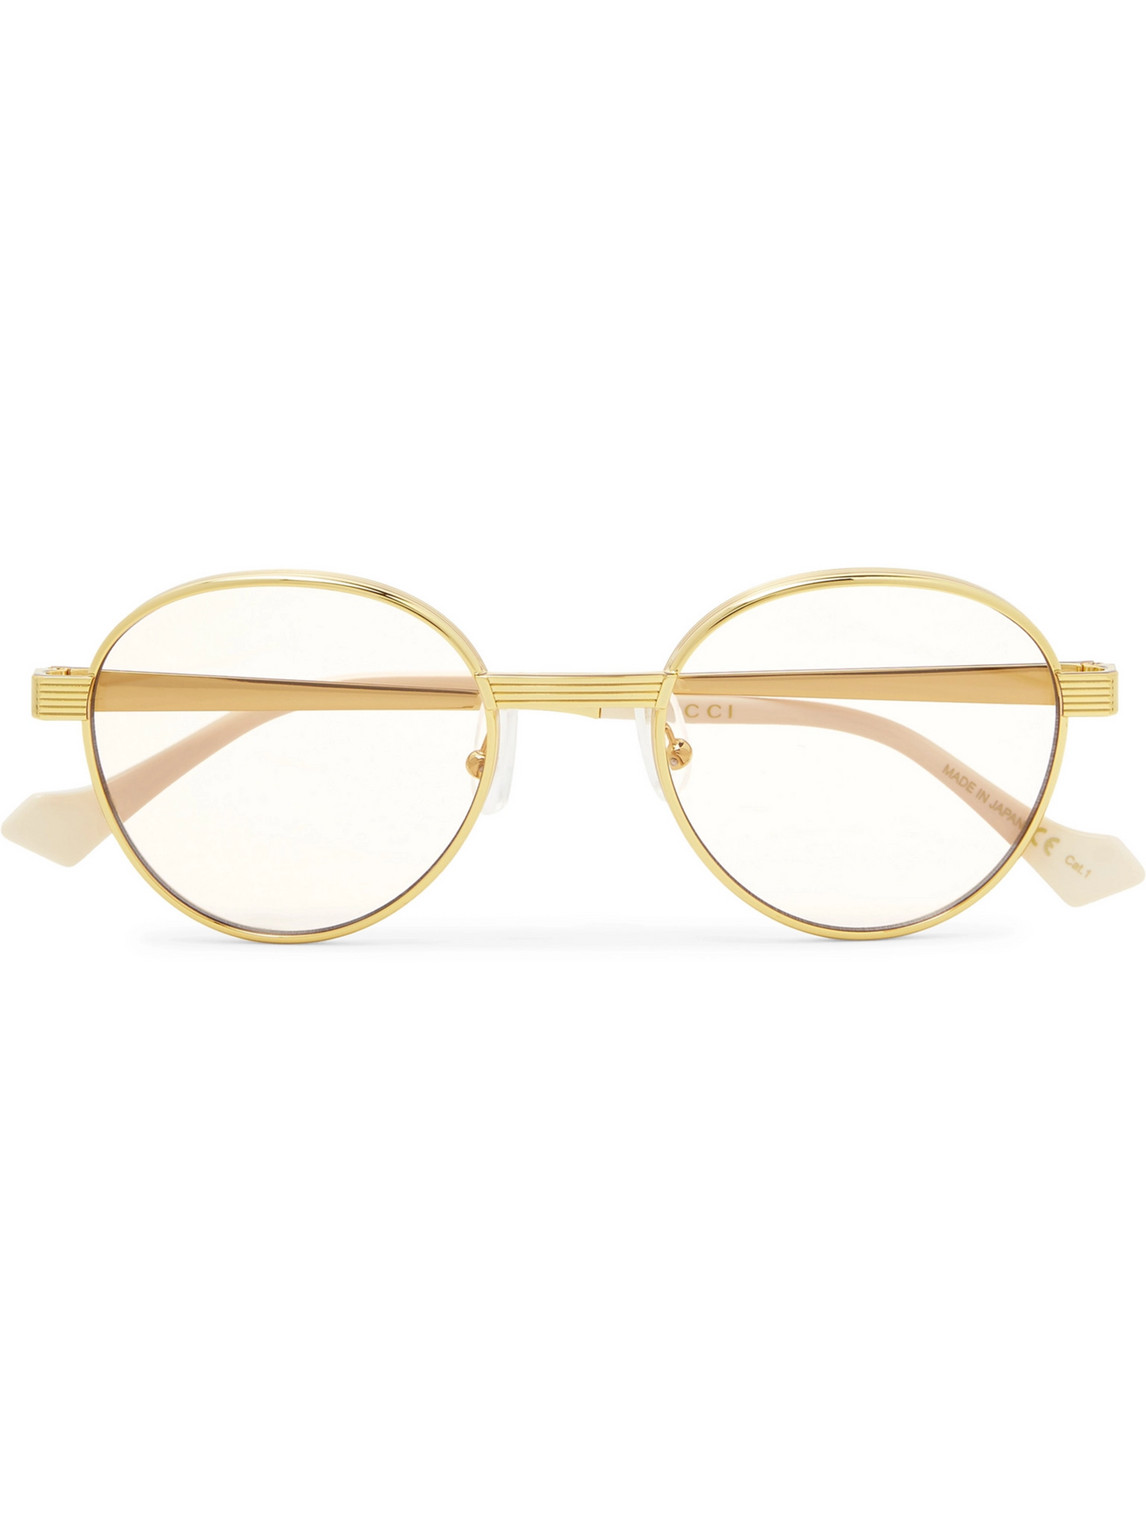 Gucci - Round-Frame Gold-Tone Sunglasses - Men - Gold